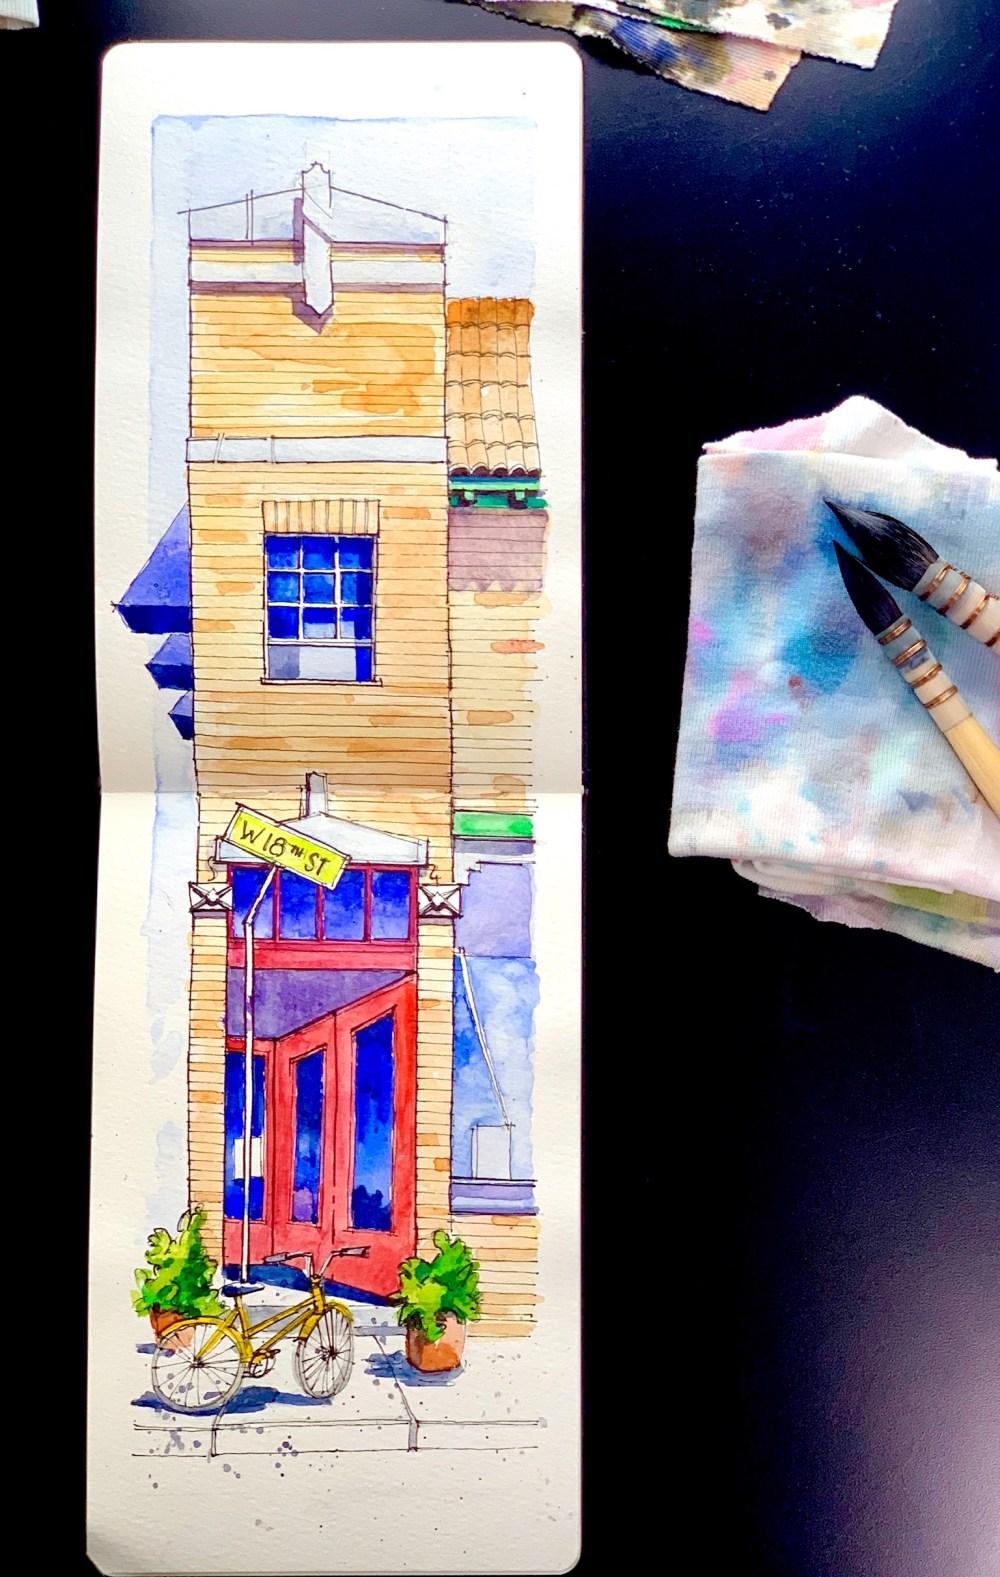 Moleskine Sketchbook over black desk with mop brushes. Brick building with red door watercolor and ink sketch